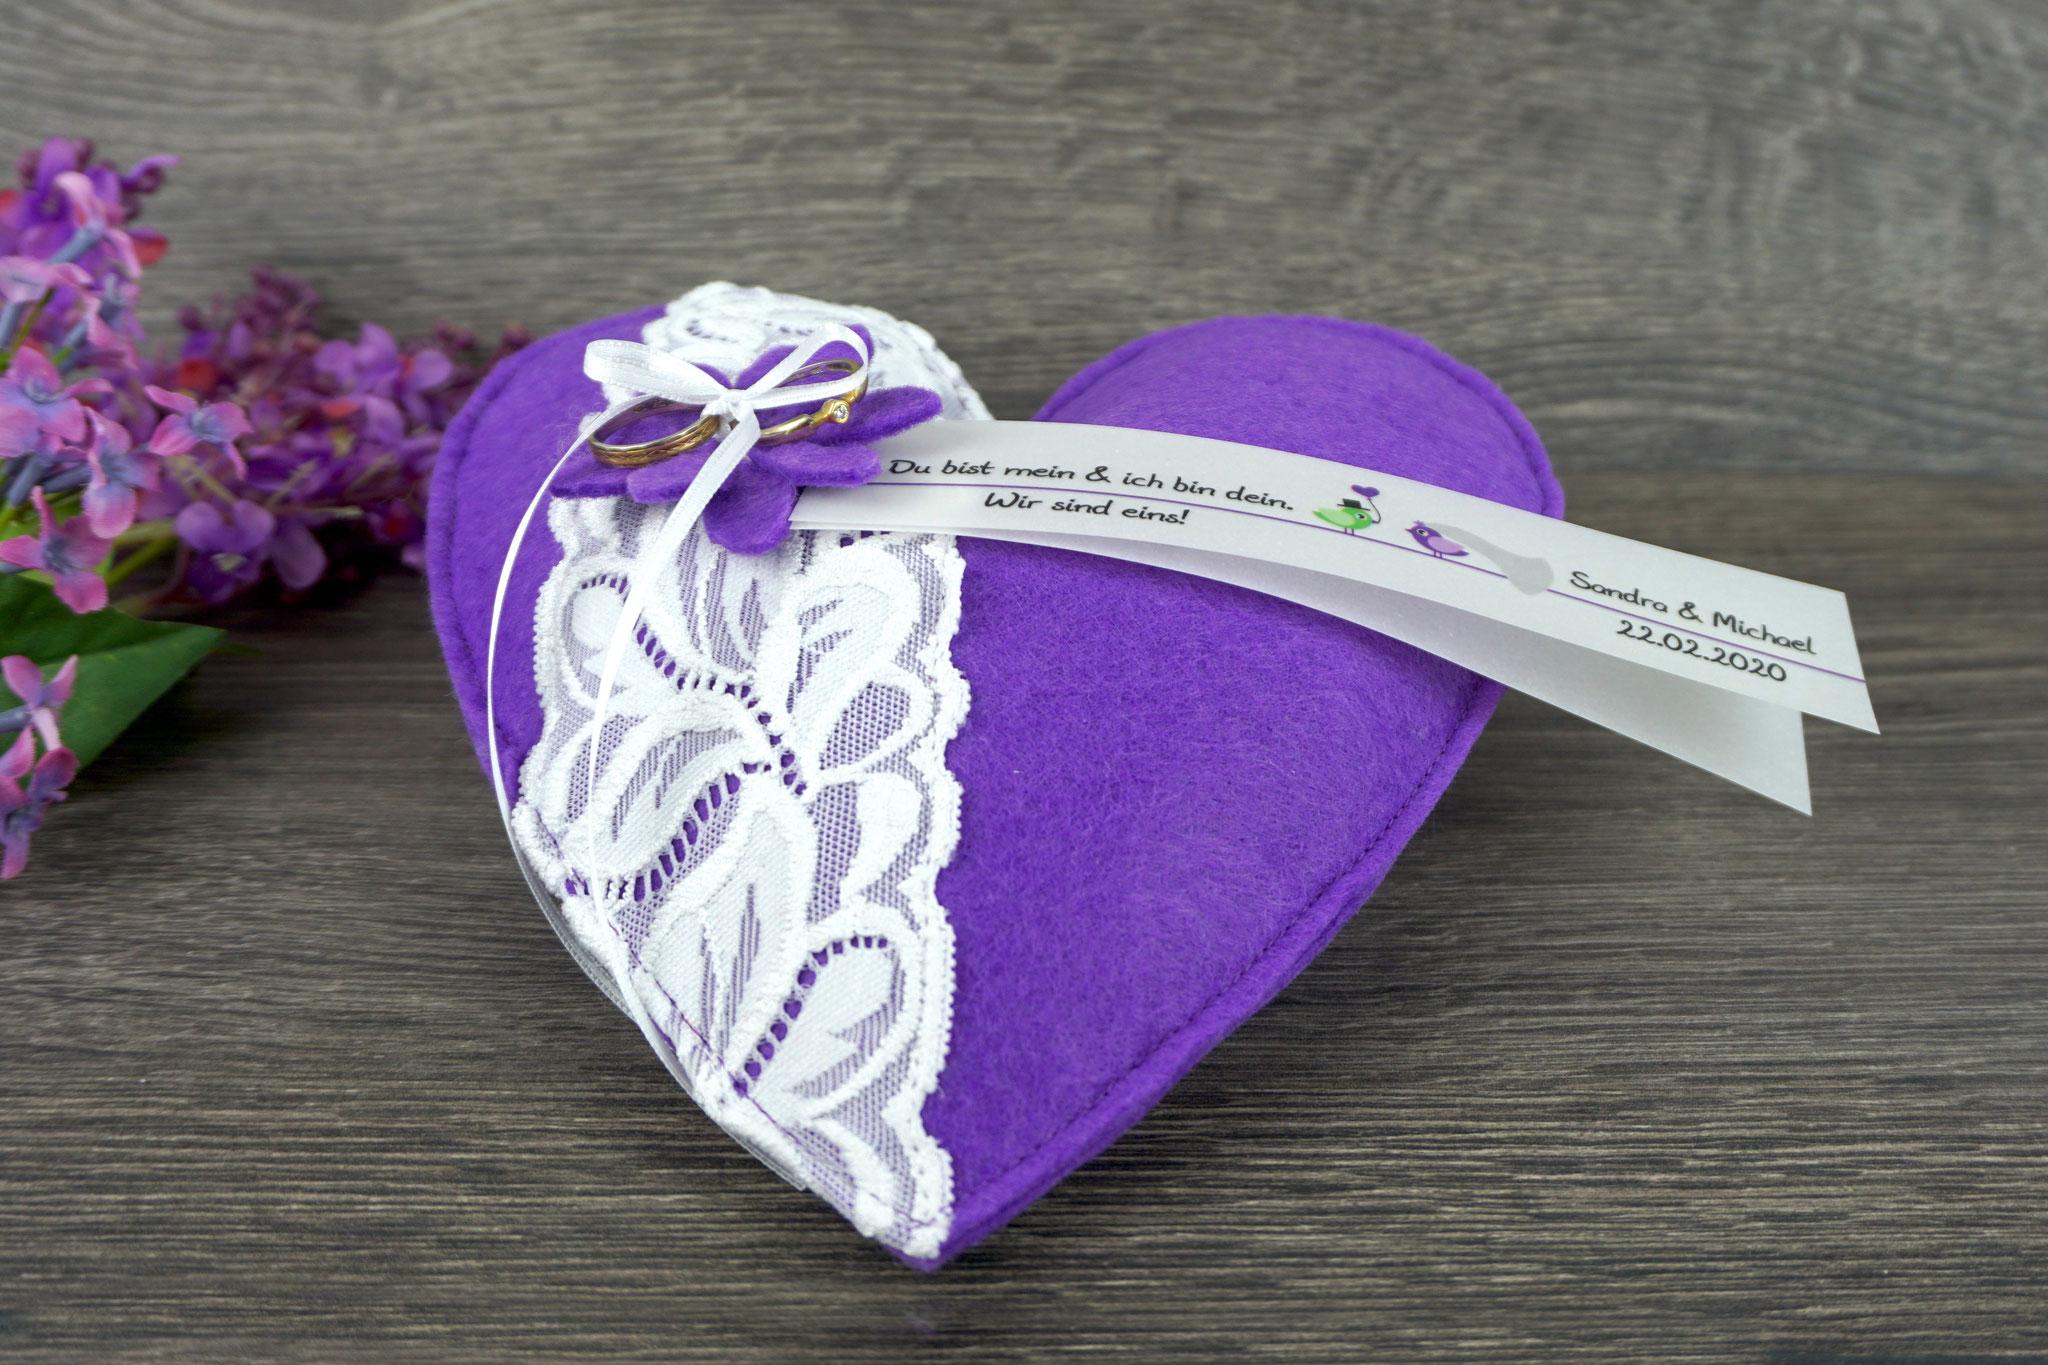 Ringkissen Herz Filz Lila - Design Hochzeitsvögel